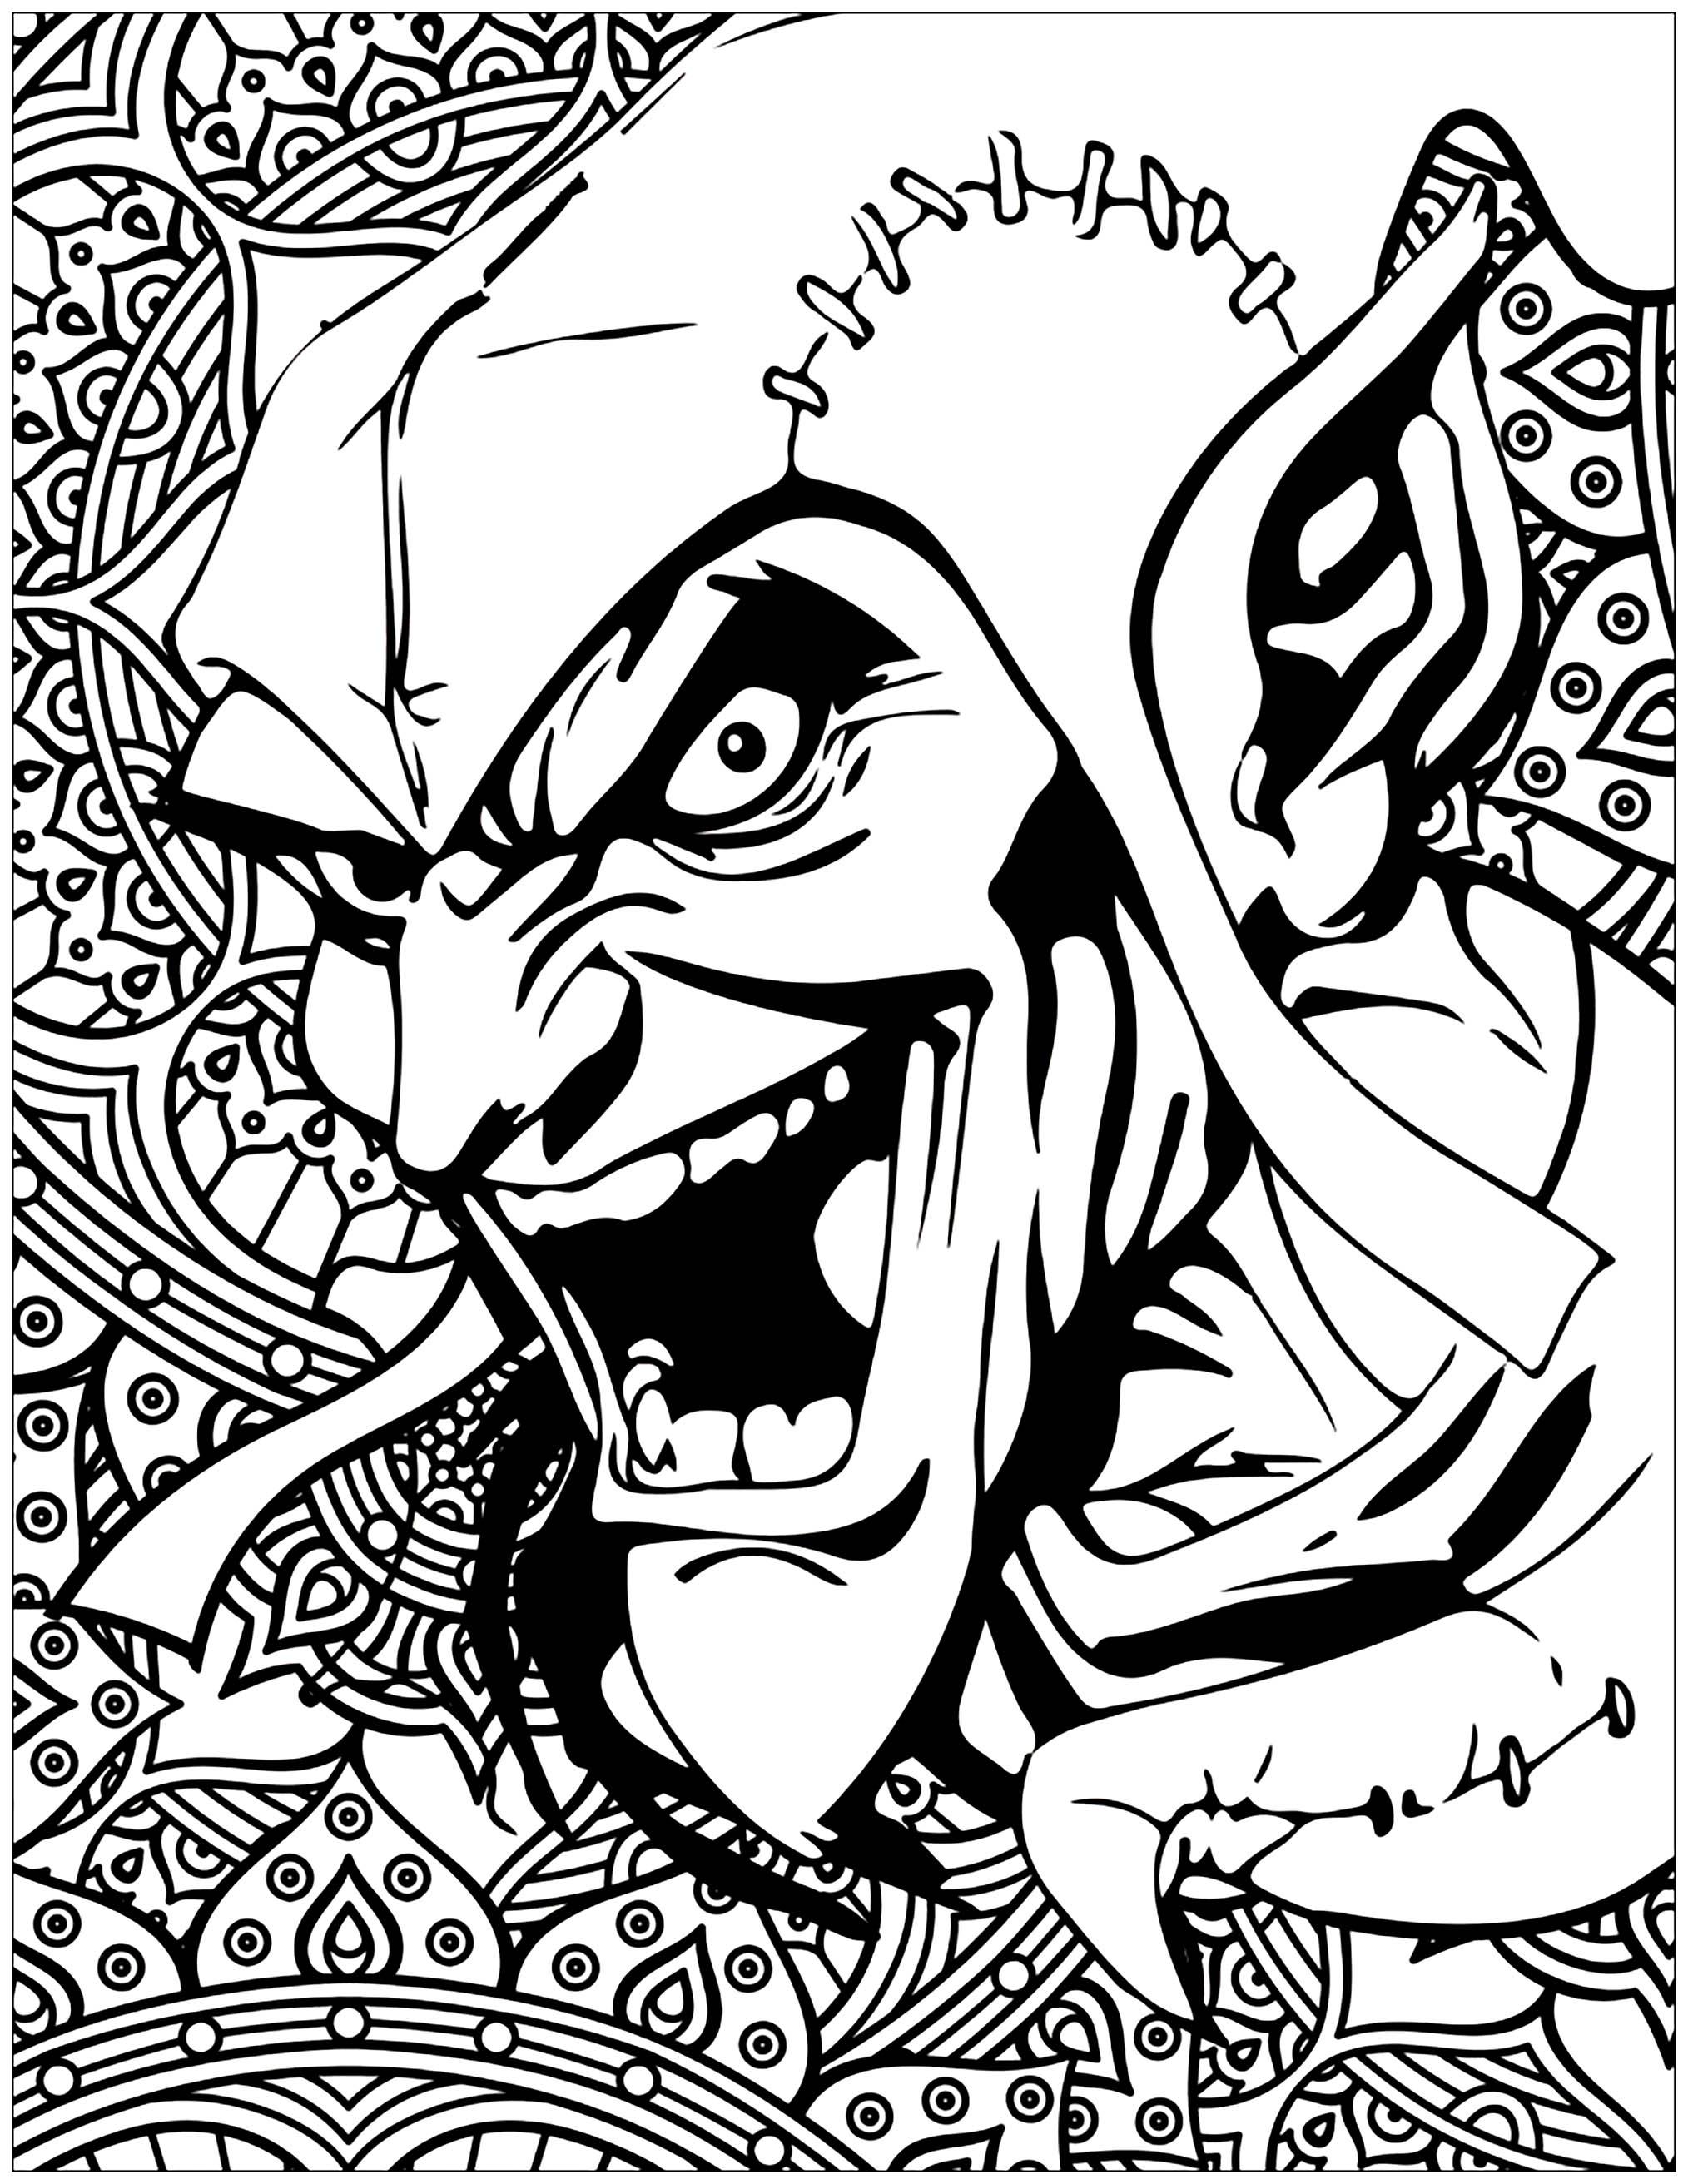 Série Les méchants de Marvel : Le Bouffon vert (Green Goblin)